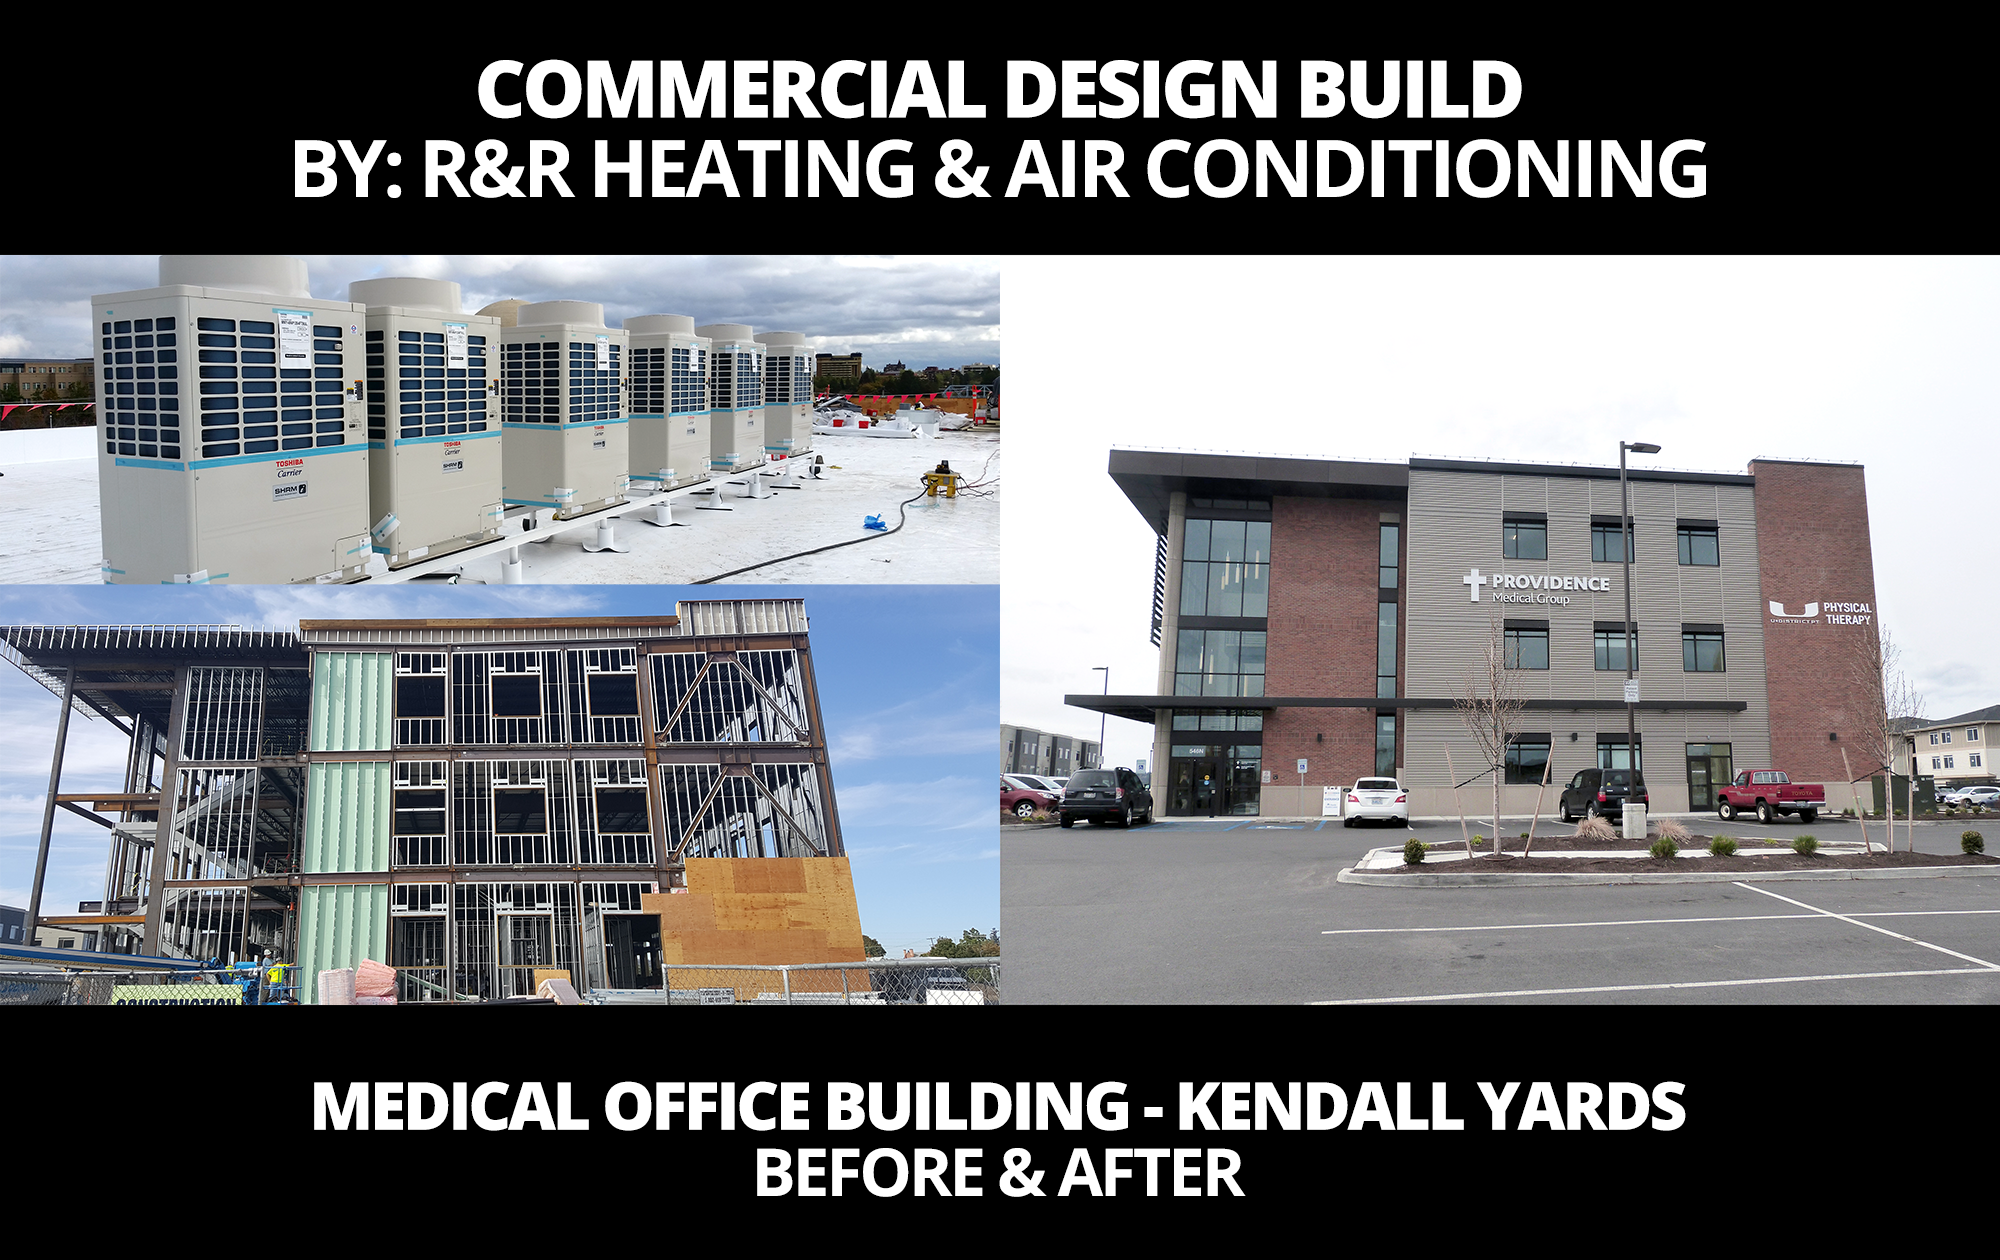 Commercial Design Build Commercial design